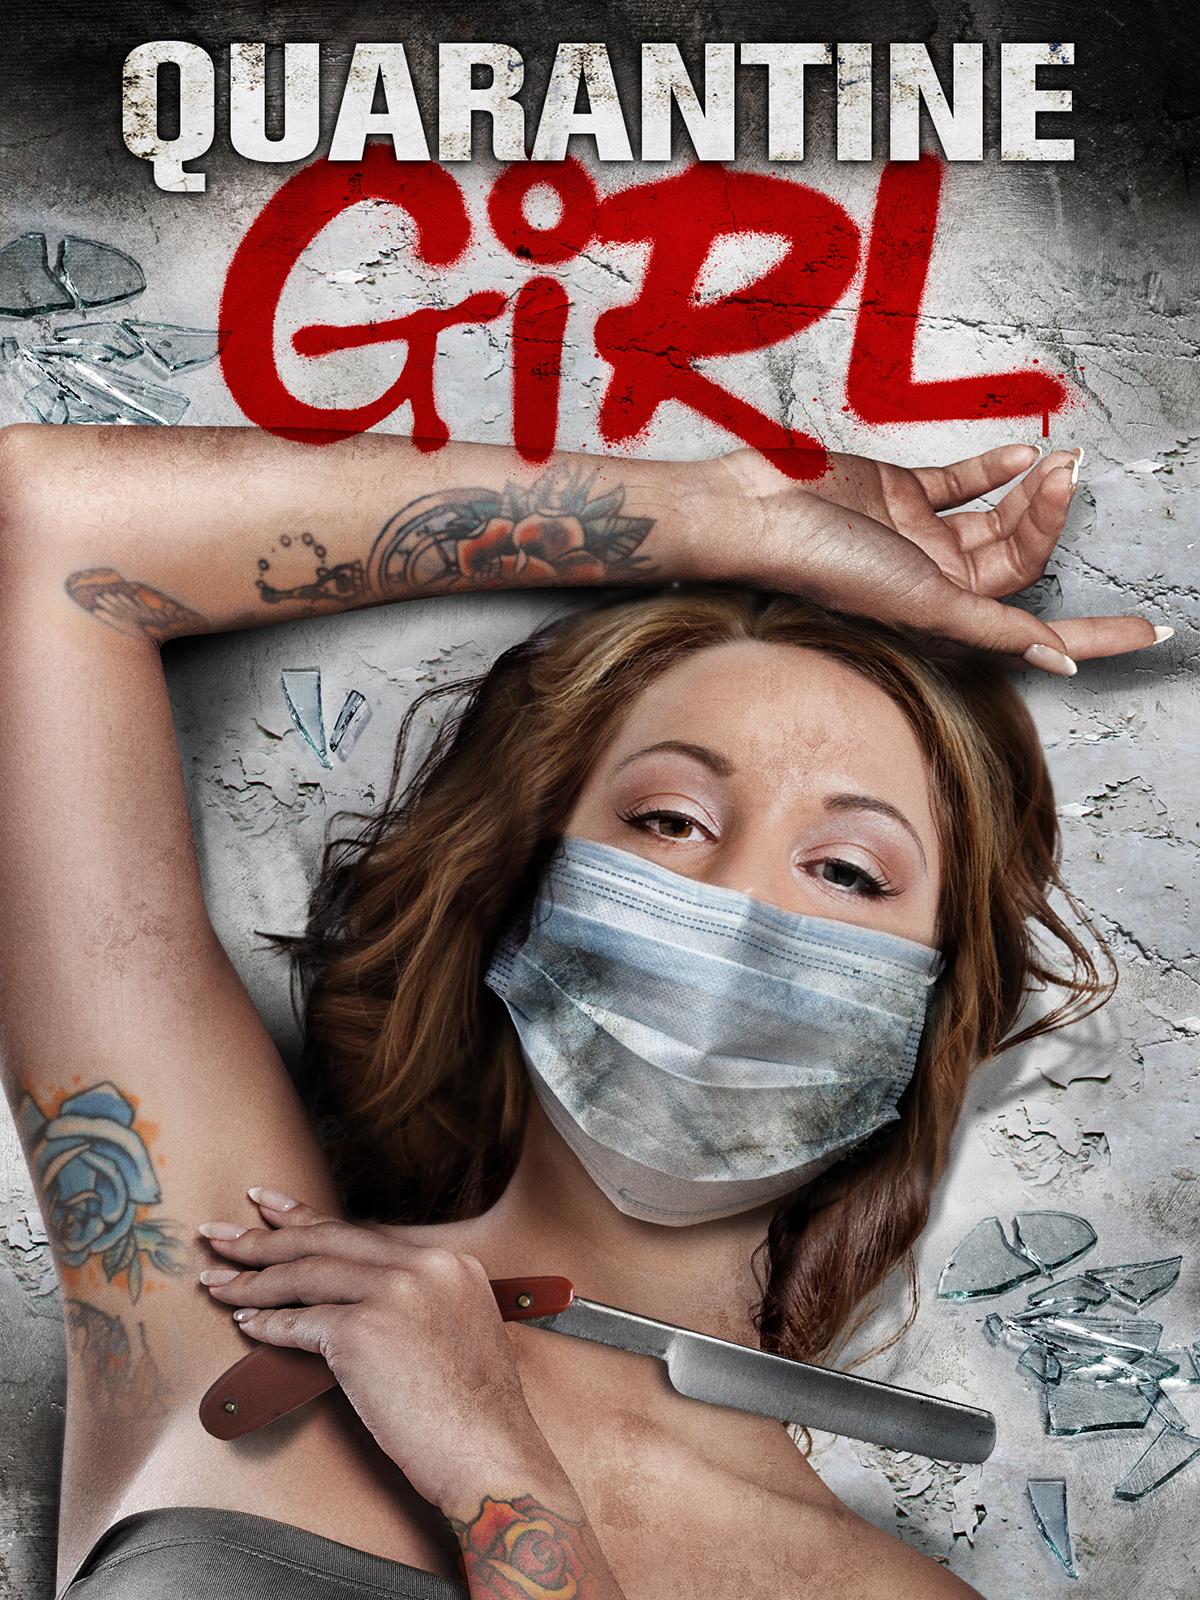 Quarantine Girl 2020 English 720p HDRip ESub 800MB | 200MB